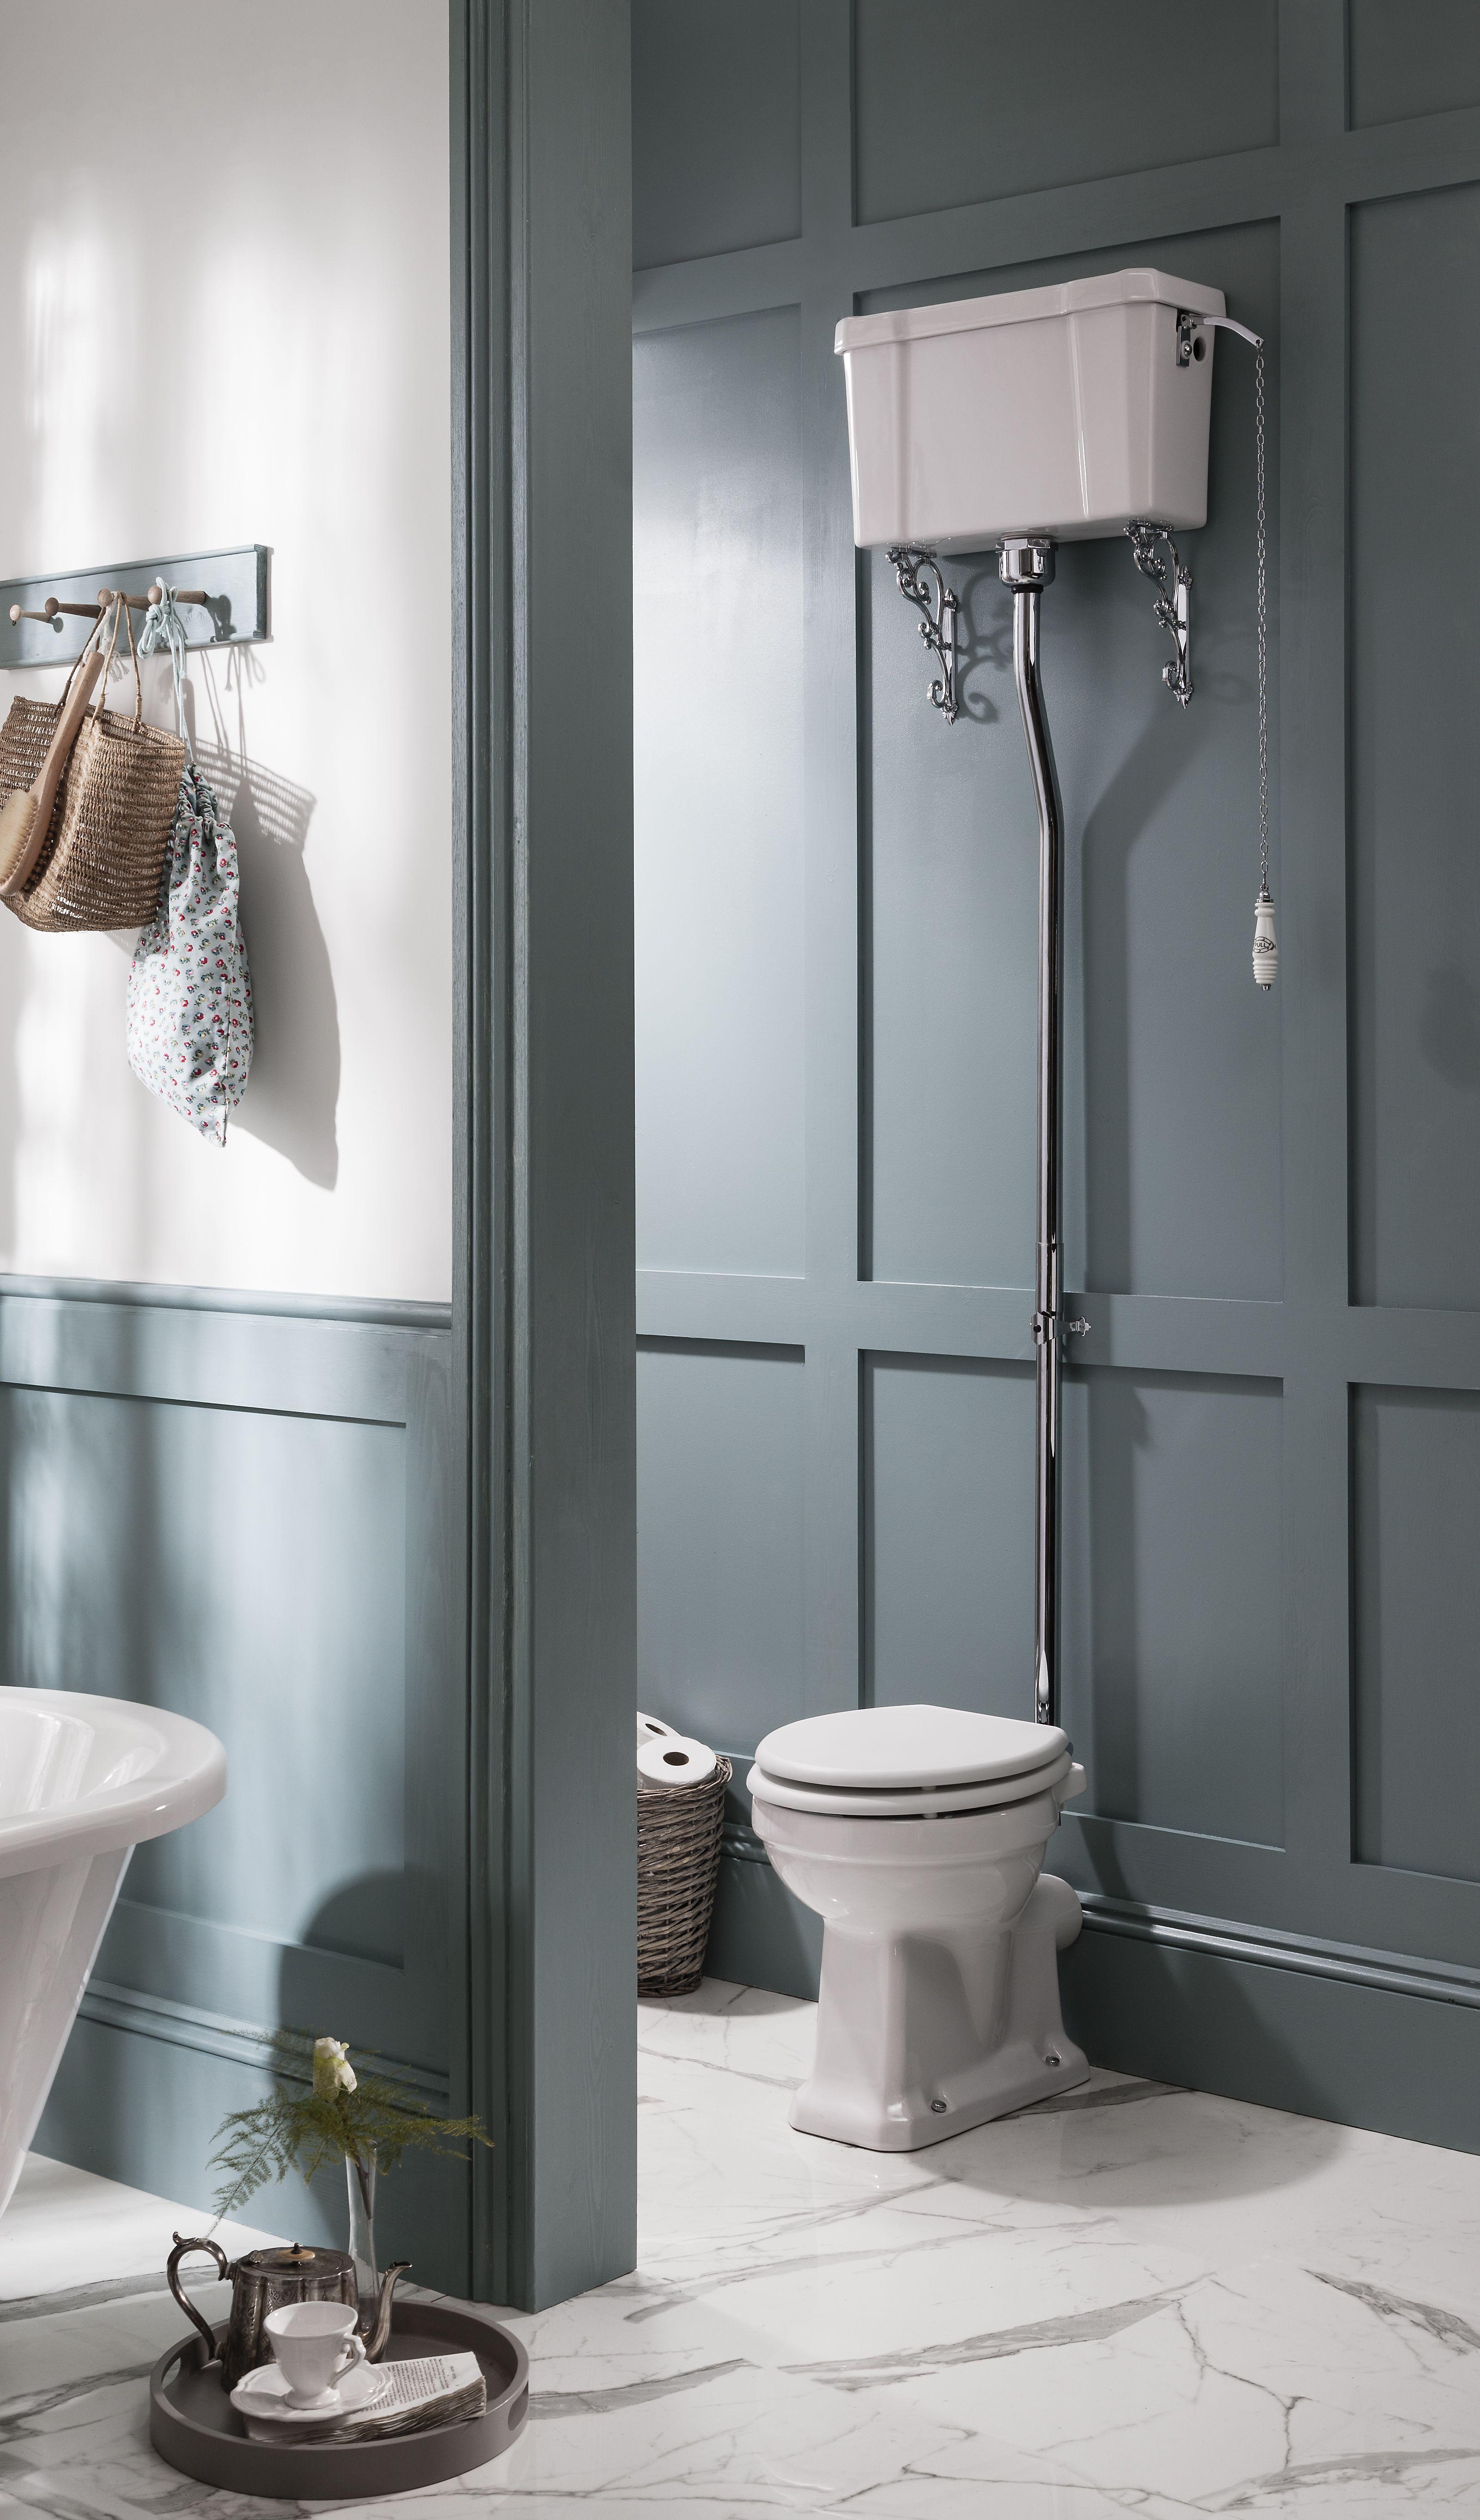 Burlington High Level Cistern Bathroom Accessories Luxury